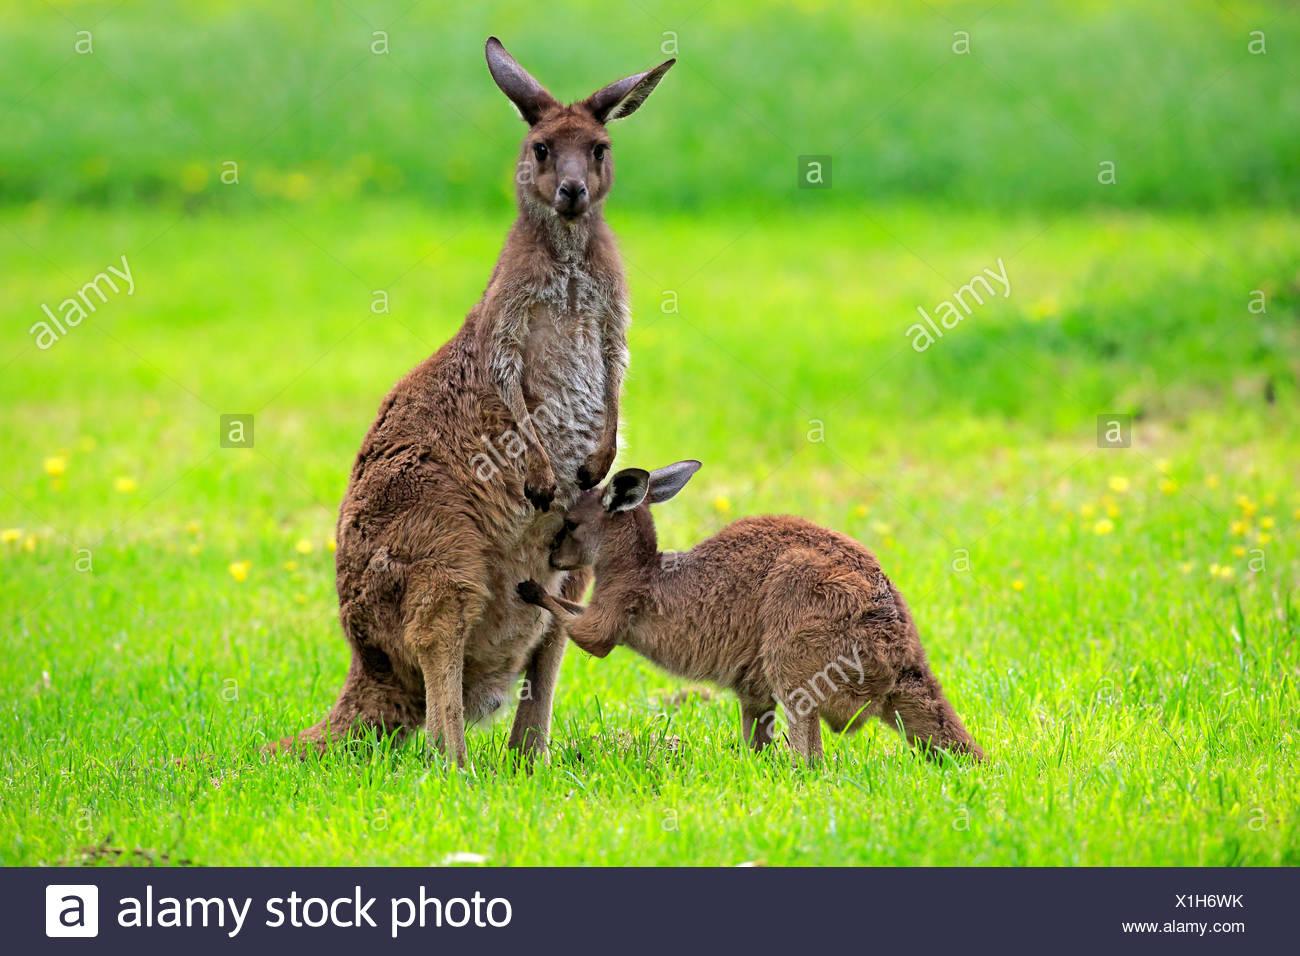 Kangaroo Island Kangaroo, female with young, South Australia, Australia / (Macropus fuliginosus fuliginosus) - Stock Image